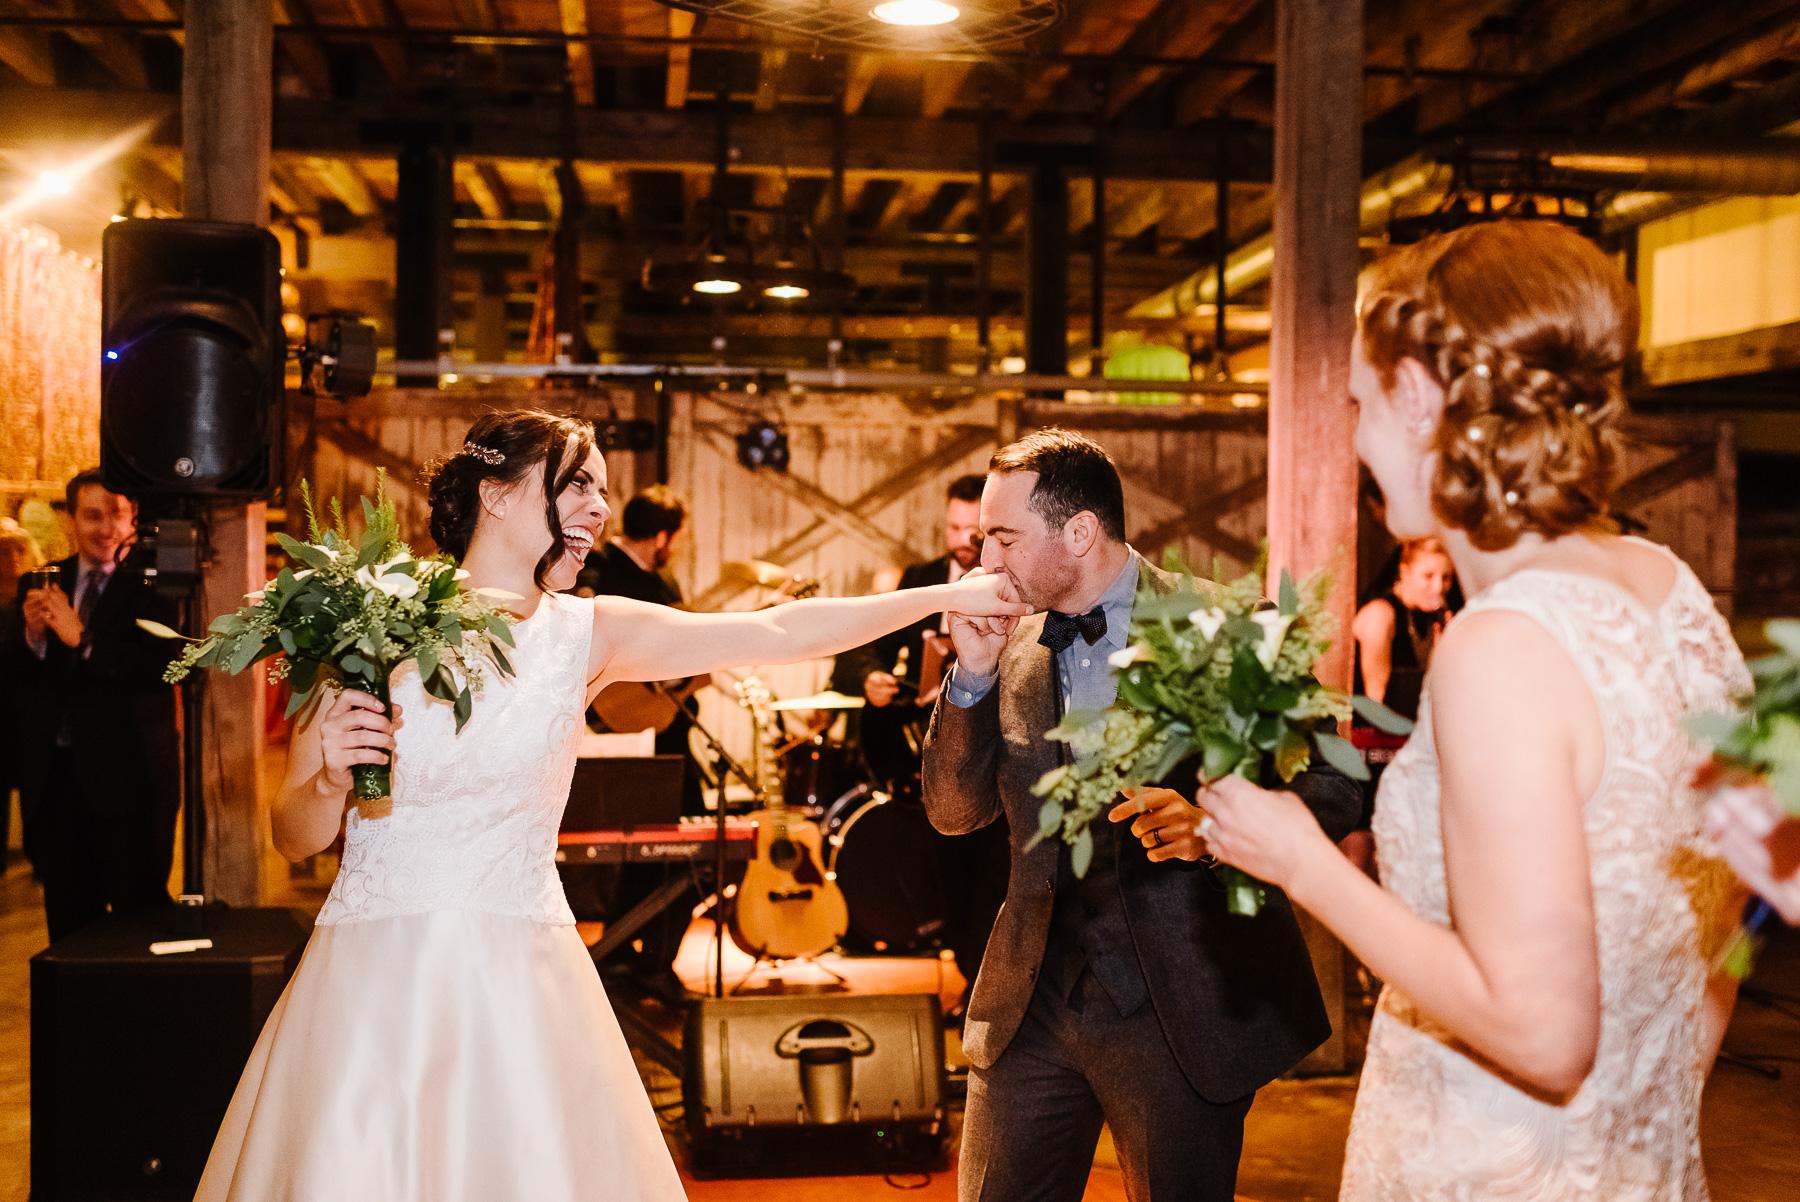 104-Laurita Winery Wedding New Jersey Wedding Photographer Laurita Winery Weddings Longbrook Photography.jpg